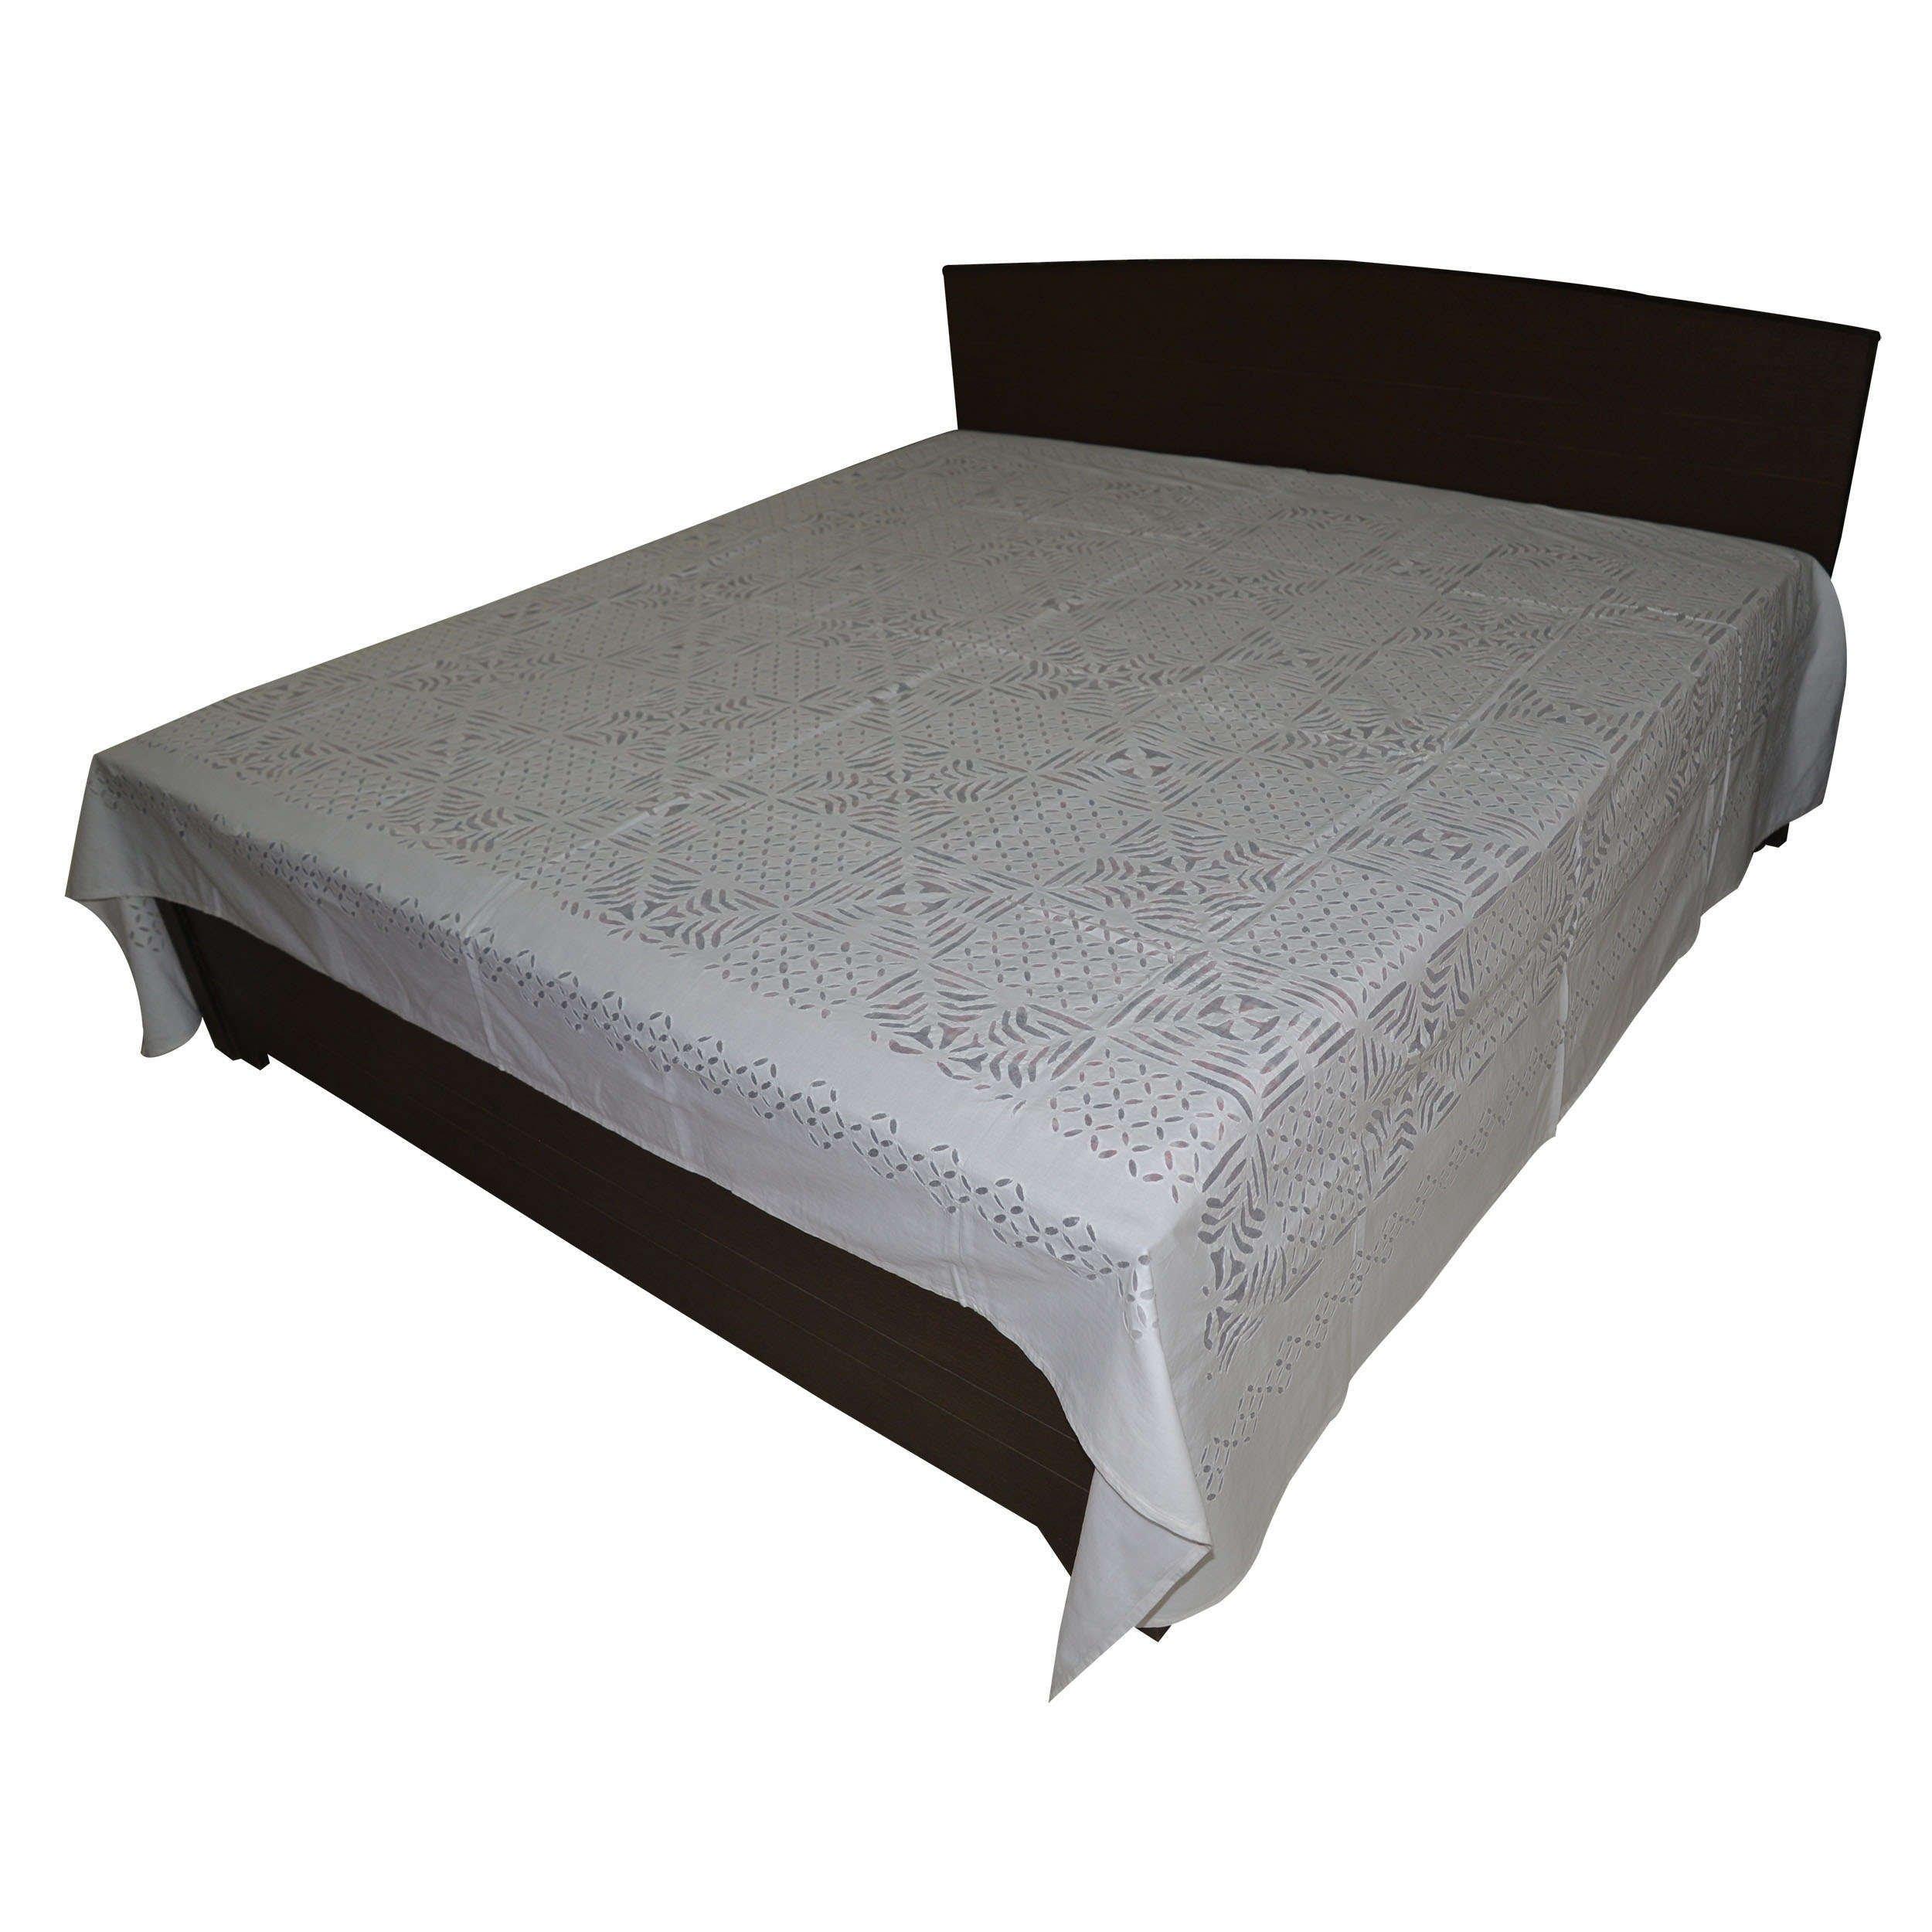 DronaIndia Applique Cutwork Hand Embroidered White Flat Sheet Floral Design Cotton Bedsheet